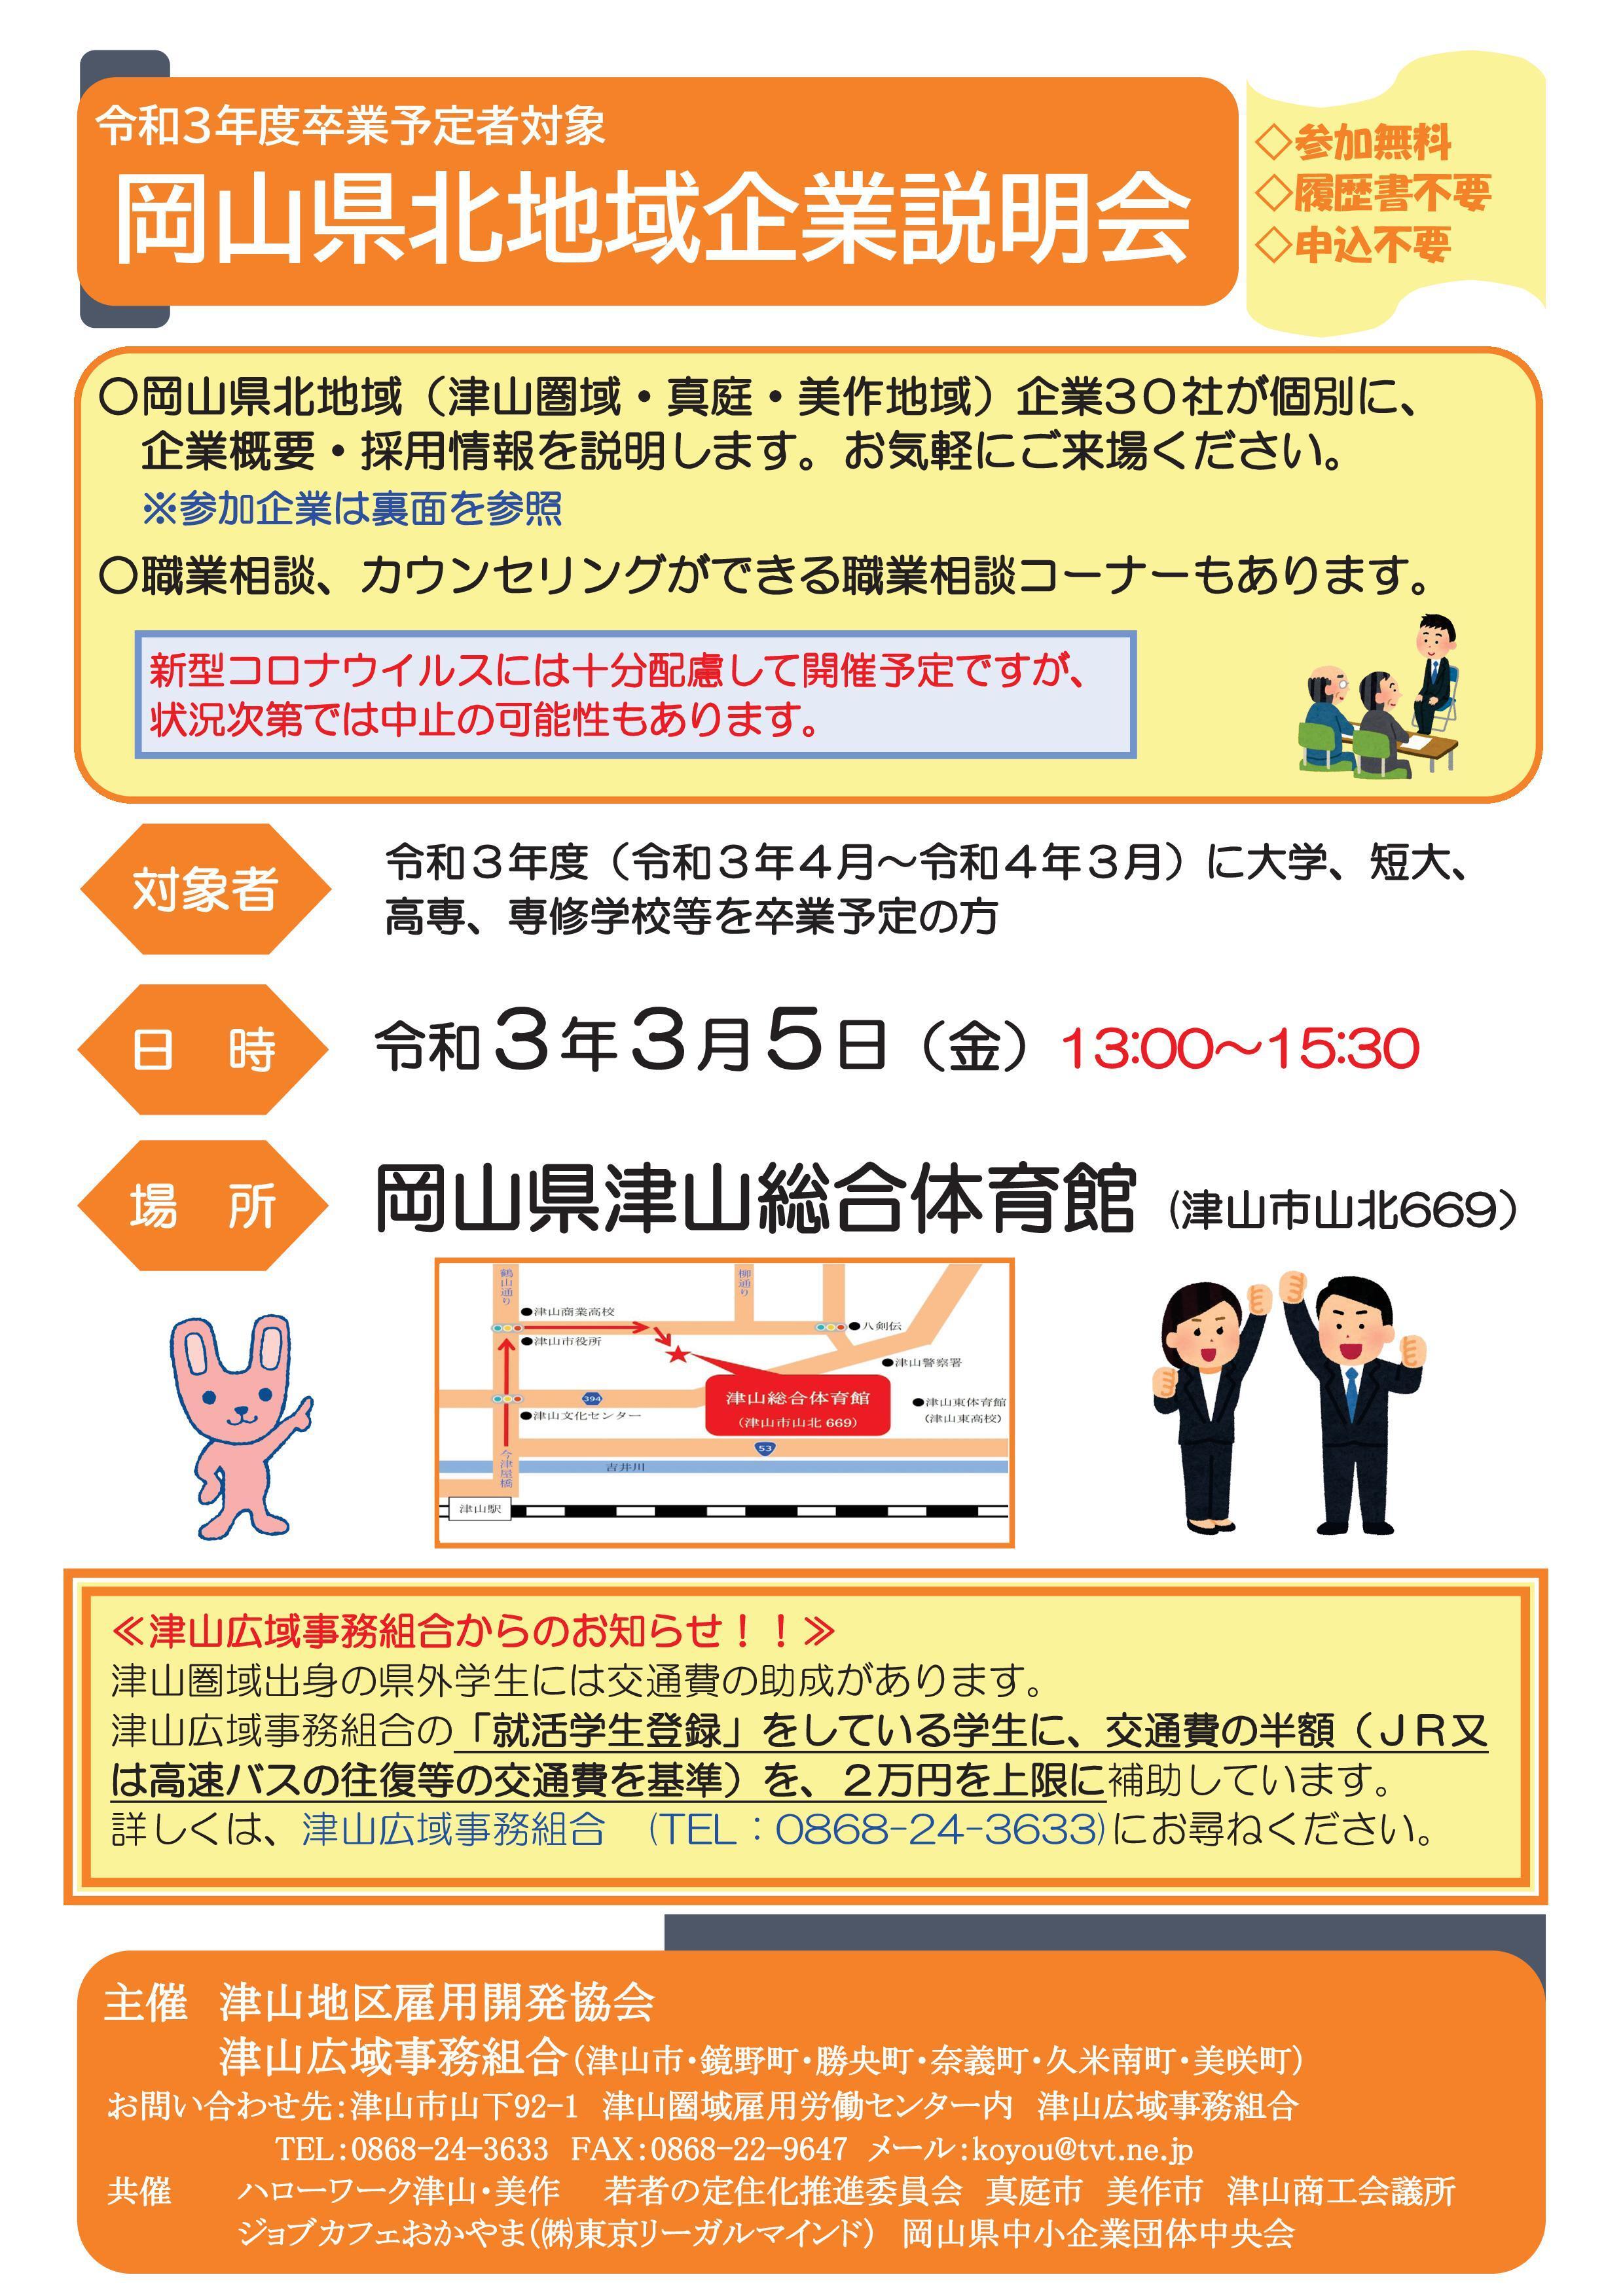 2021年3月5日(金)開催 「岡山県北地域企業説明会」参加者募集のお知らせ